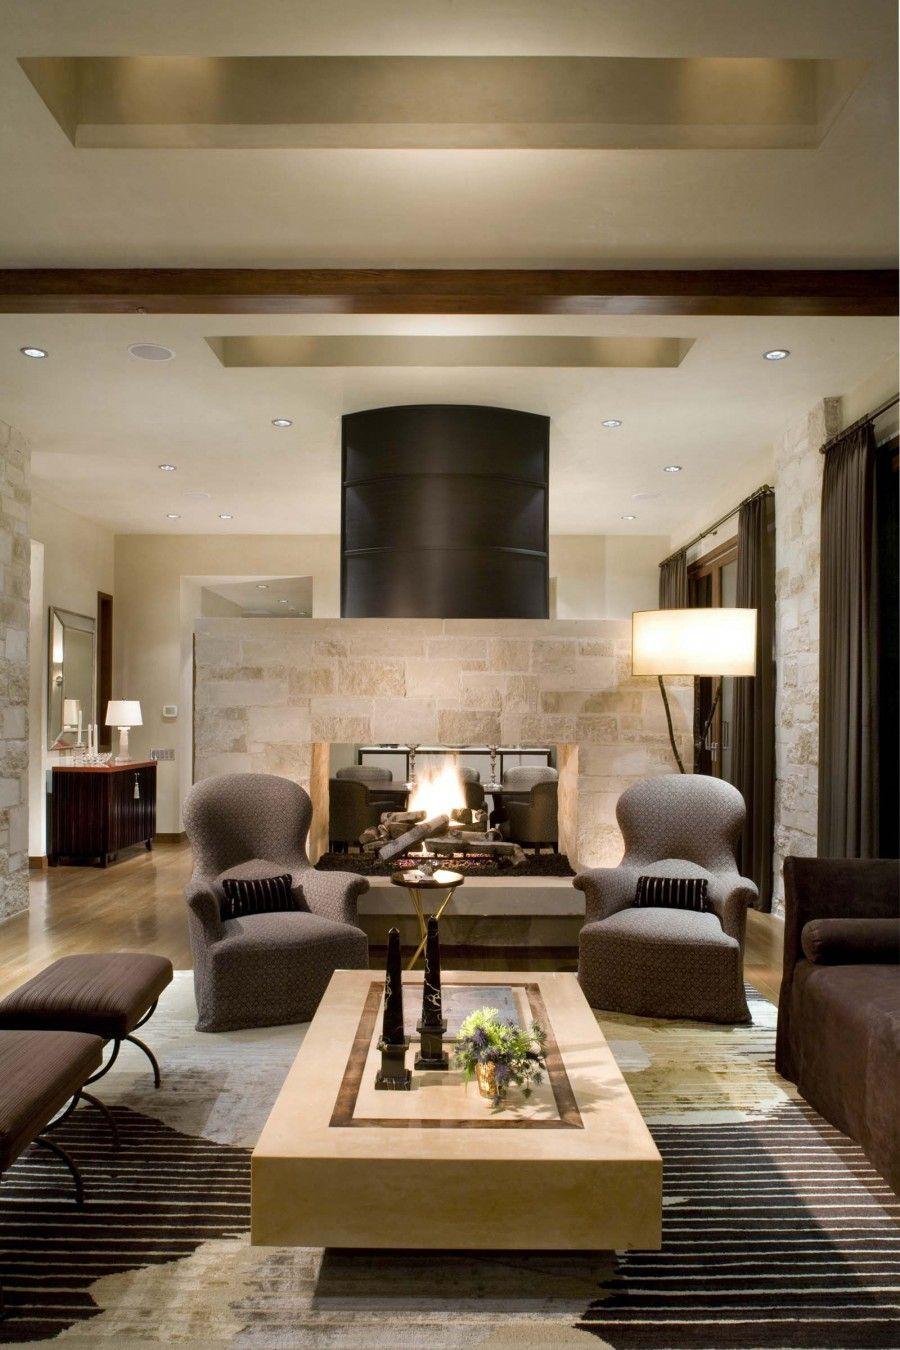 78 Cozy Modern Minimalist Living Room Designs Page 5 Of 80 Living Room Decor Modern Modern Apartment Design Interior Design Living Room